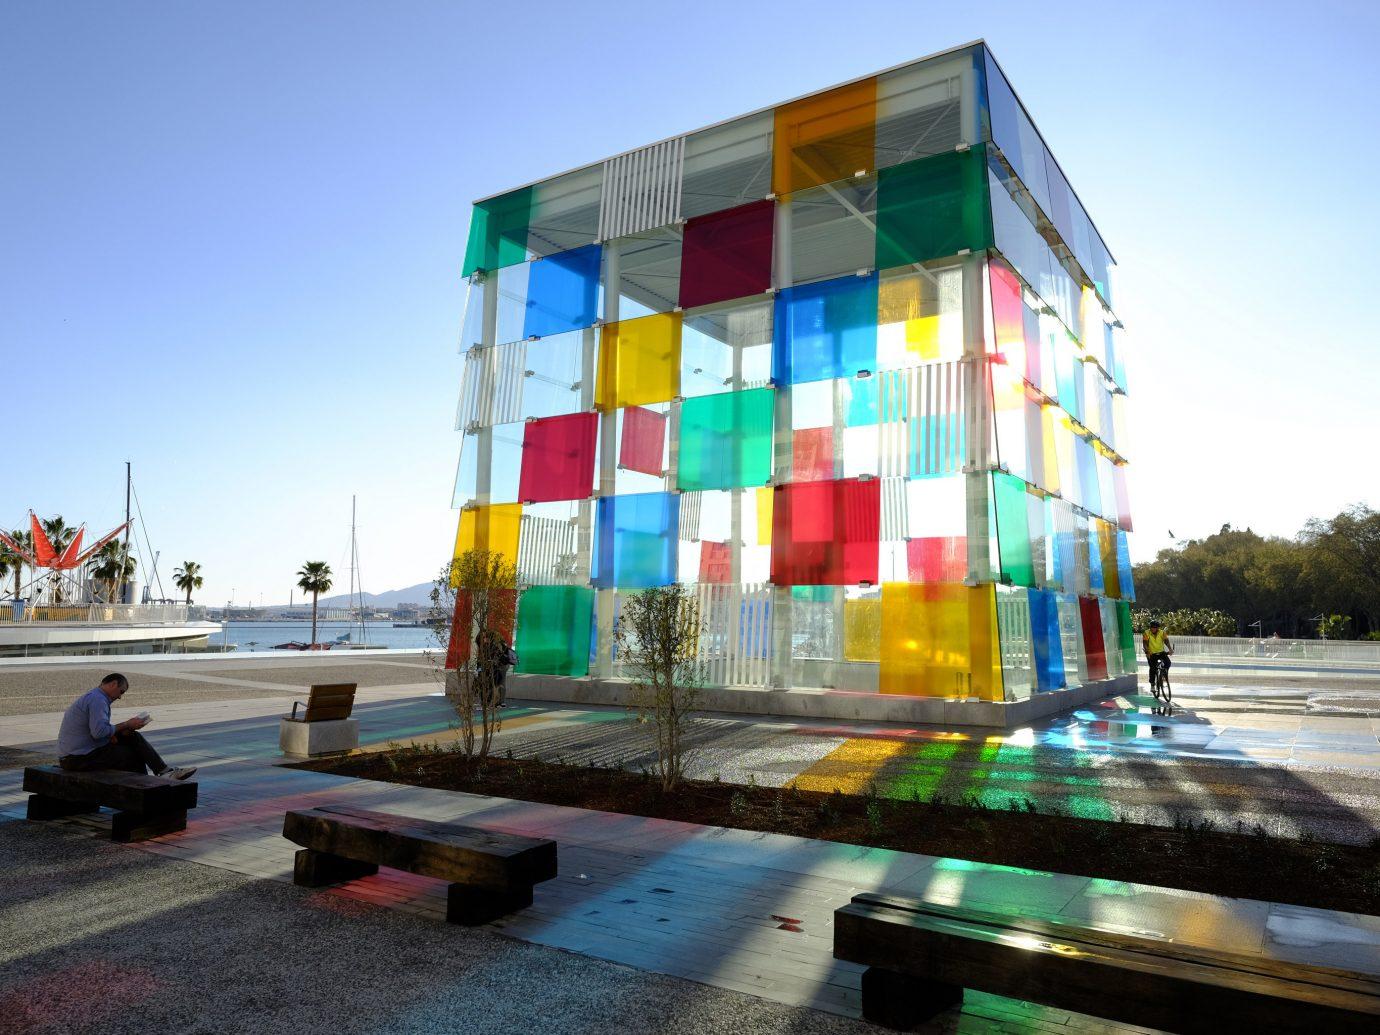 Road Trips Trip Ideas sky outdoor landmark plaza colorful